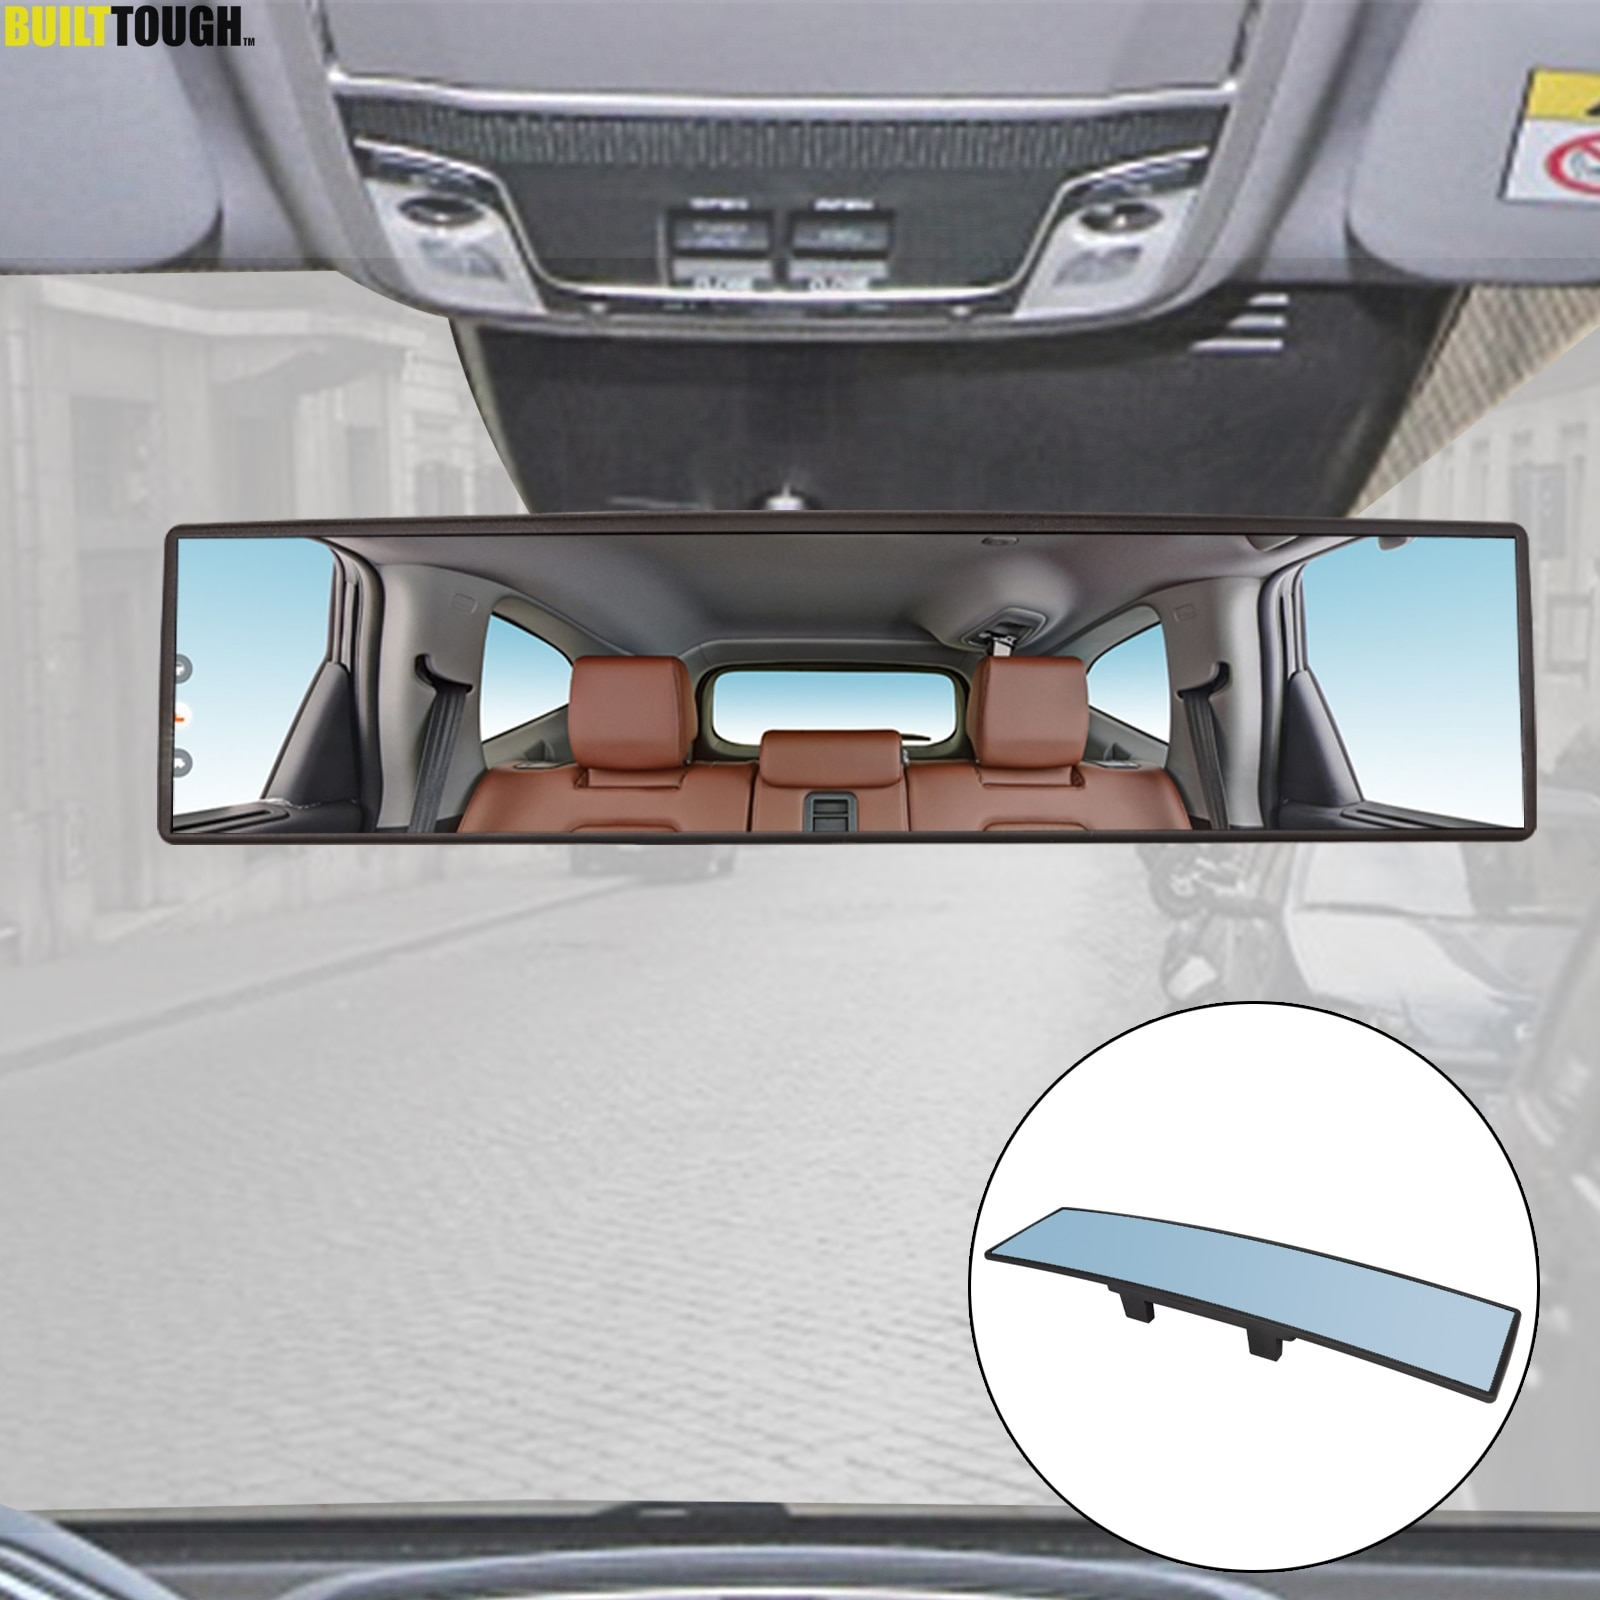 Universal Car Mirror Interior Rearview Mirrors Auto Rear View Mirror Anti-glare Wide-angle Surface Blue Mirror Auto Accessories